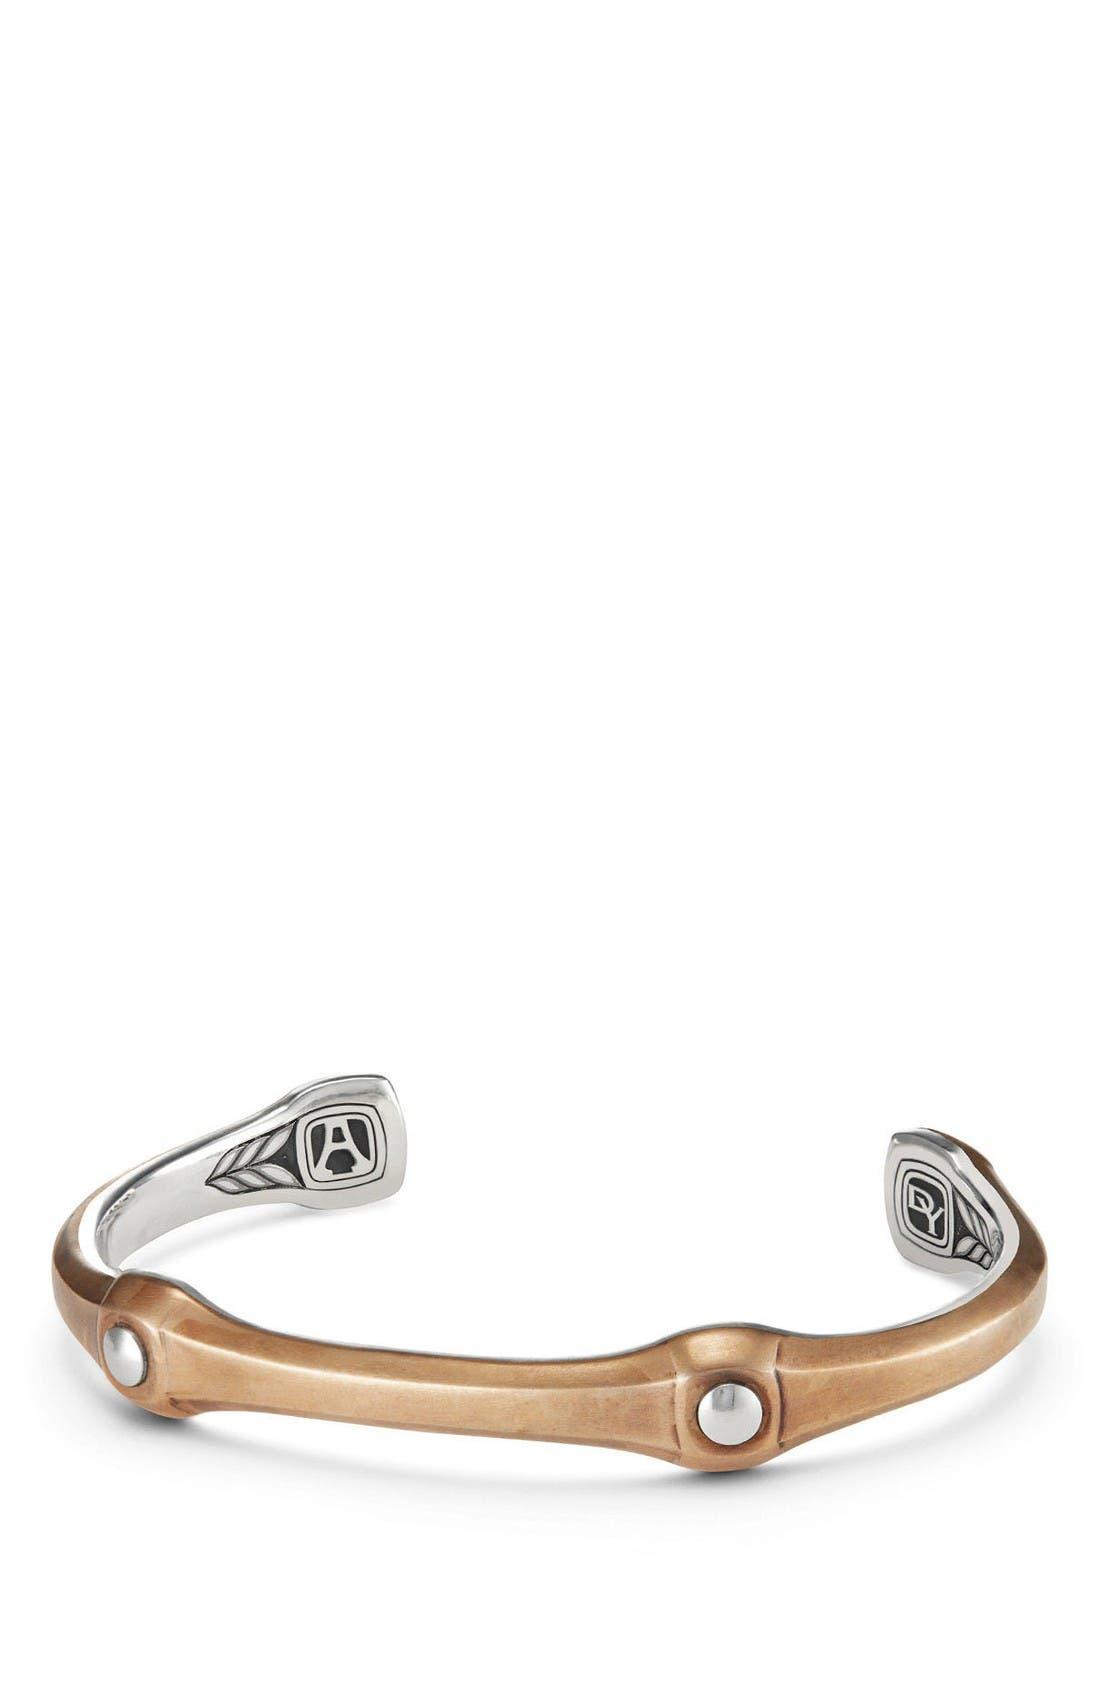 Anvil Cuff Bracelet, 10.5mm,                         Main,                         color, Silver/ Bronze